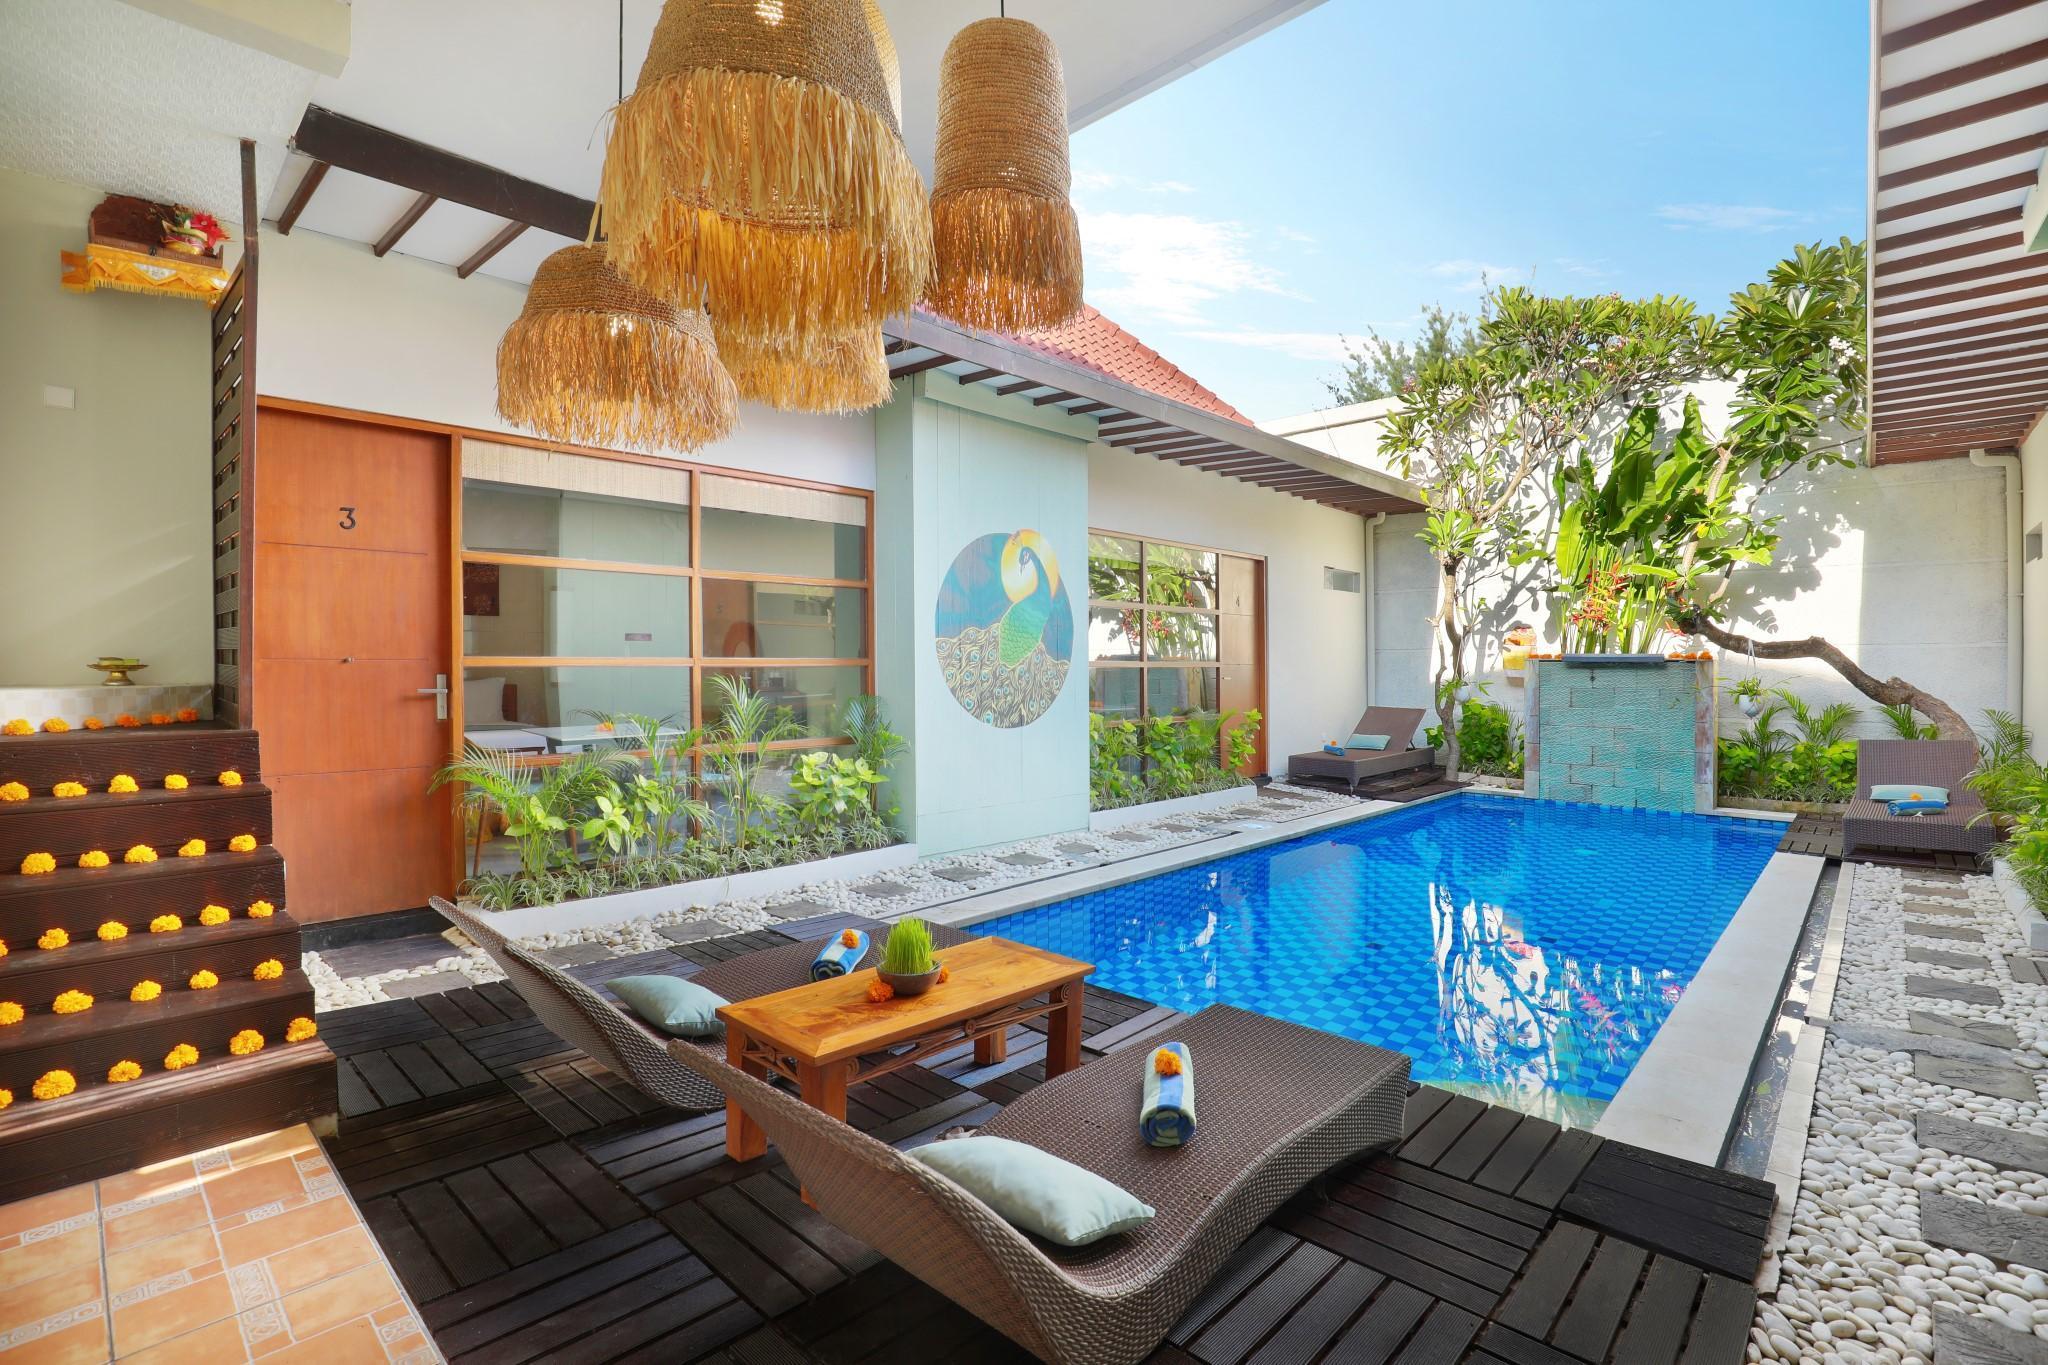 Best Price On The Vie Villa In Bali Reviews